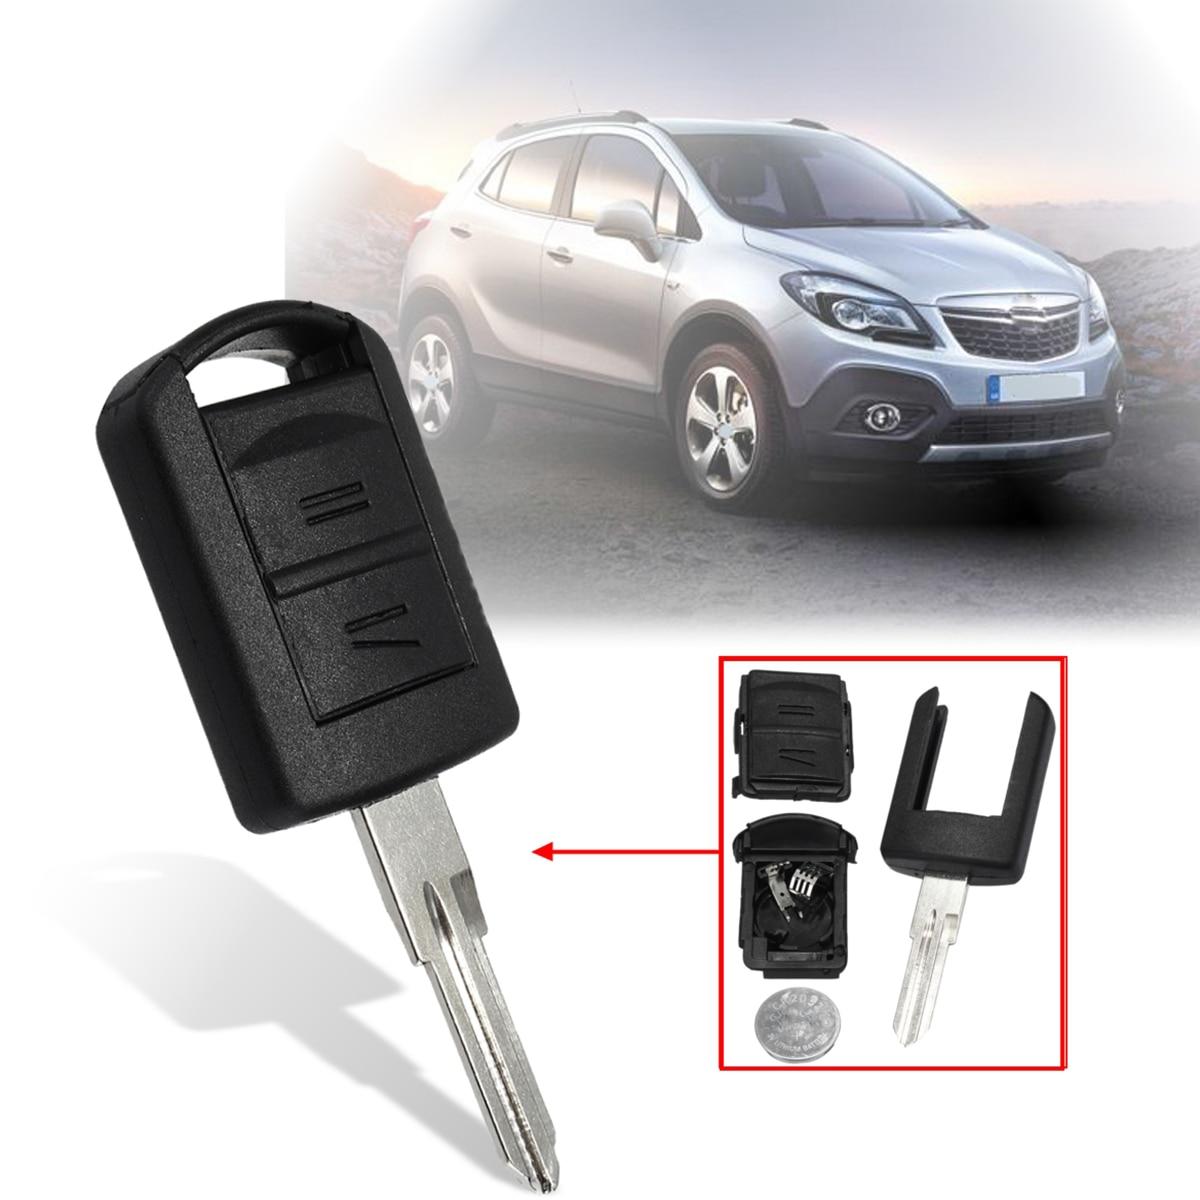 Für Opel Tech2 ZAFIRA VIVORO SINTRA SPEEDSTER CORSA ASTRA Airbag ABS PDC Service